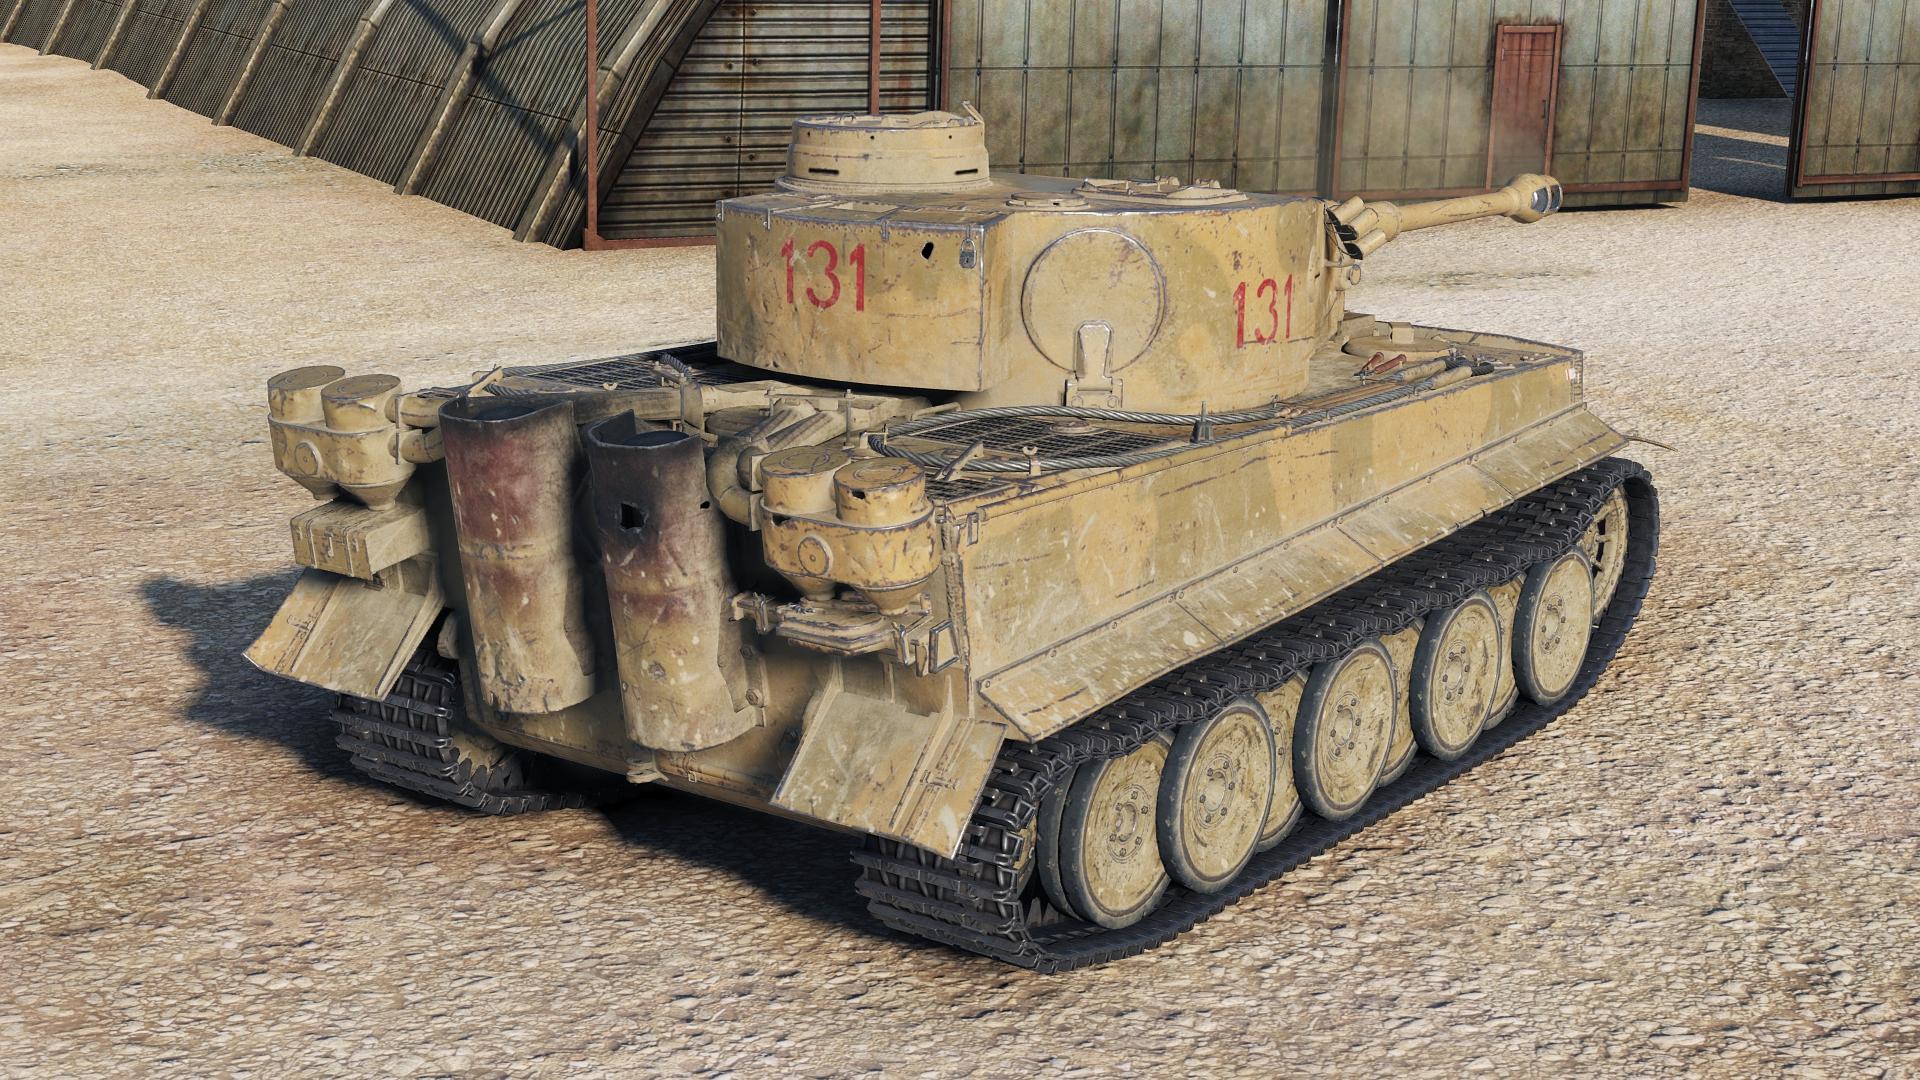 Download World Of Tanks Eu  Anno 1800 kaufen, Ano1800 Uplay Game Key